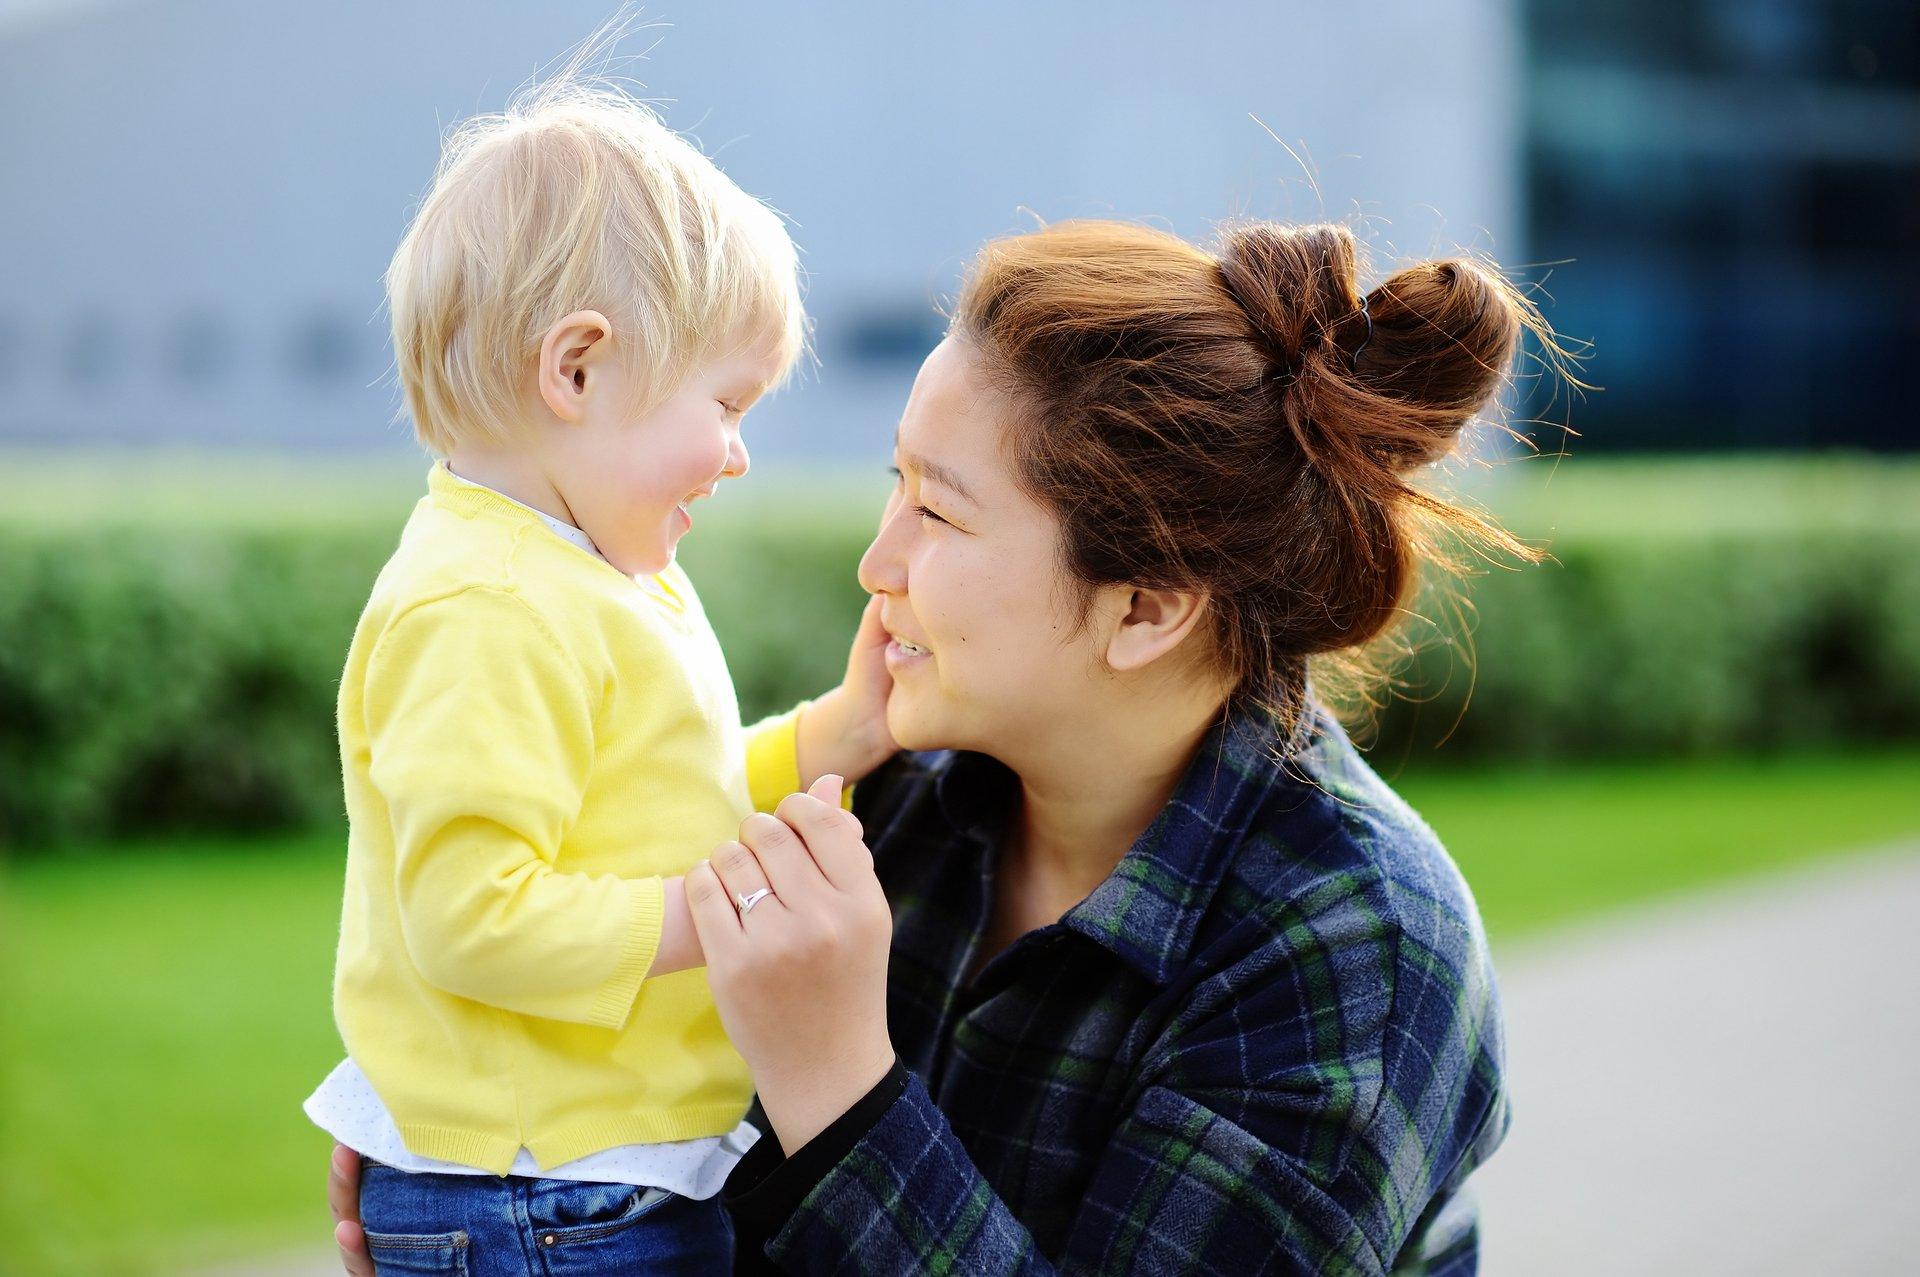 A woman babysits a toddler